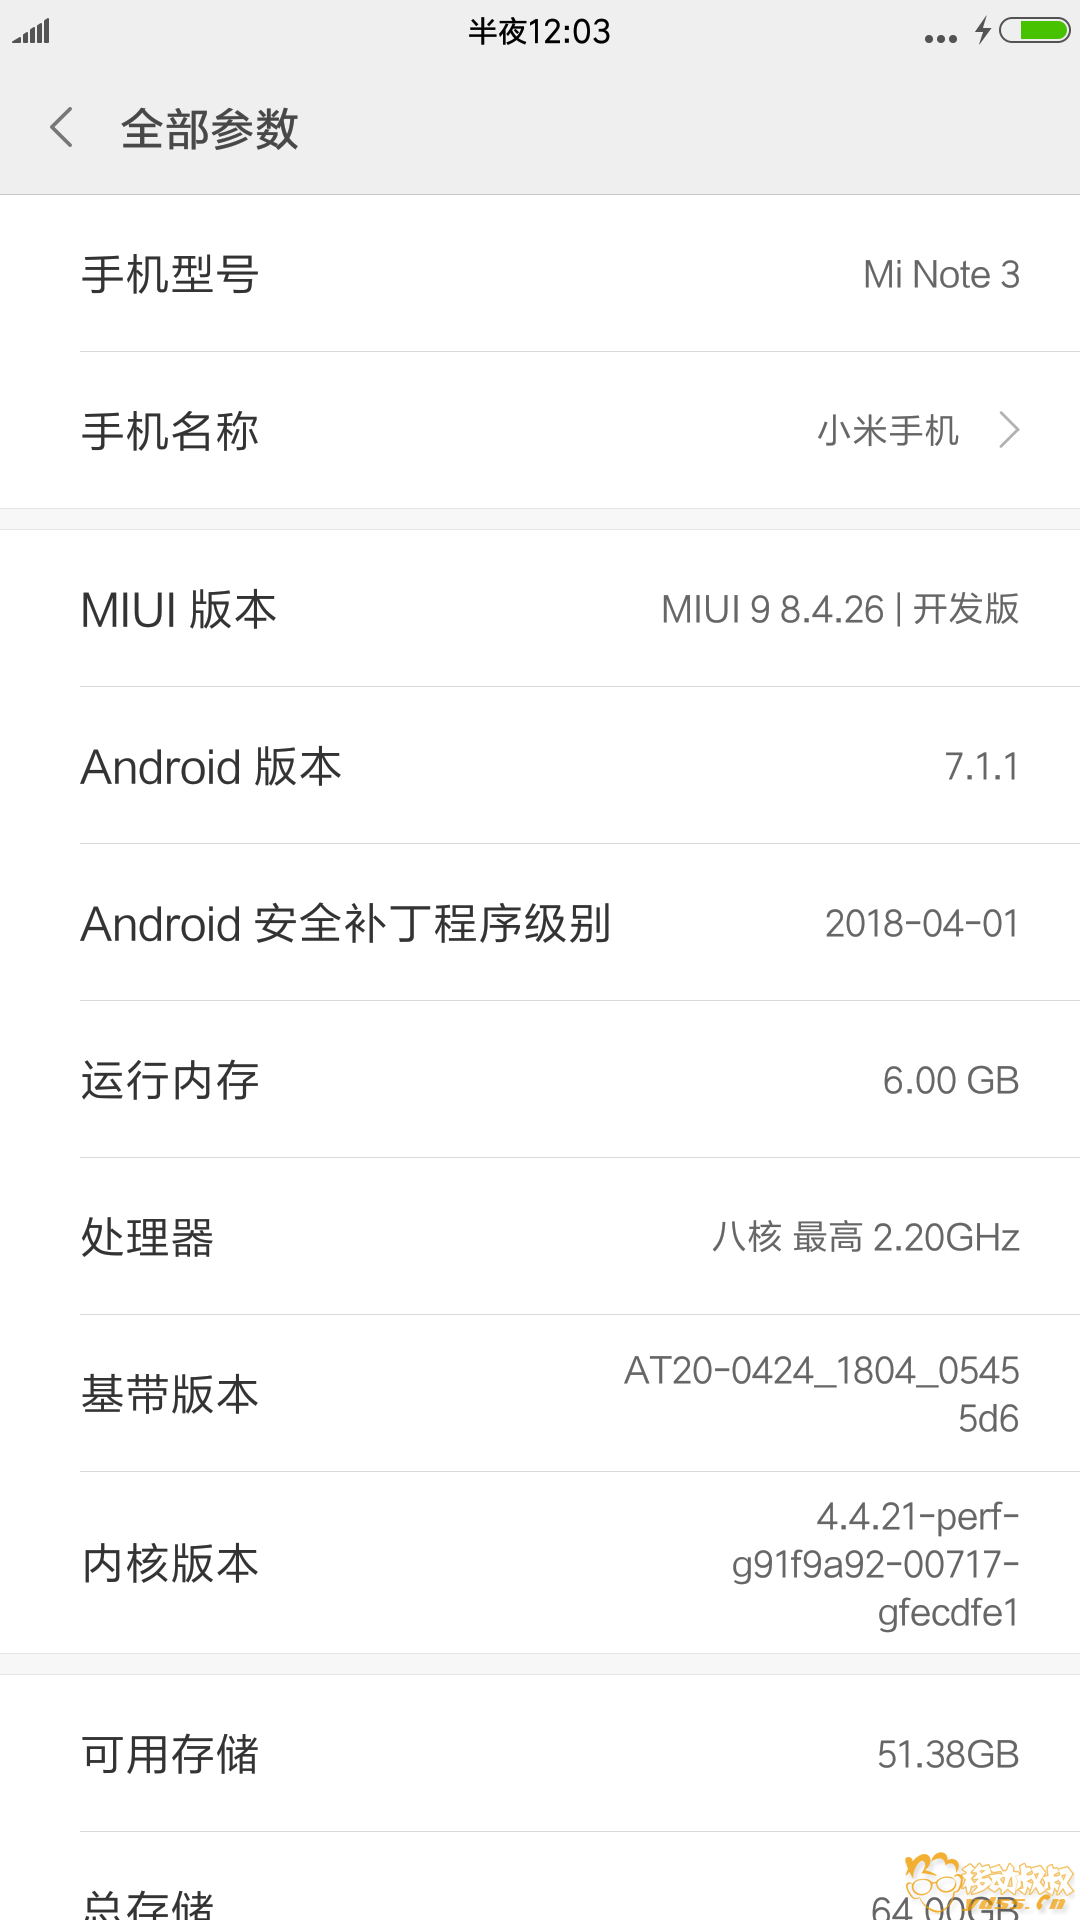 Screenshot_2018-05-07-00-03-14-286_com.android.settings.png